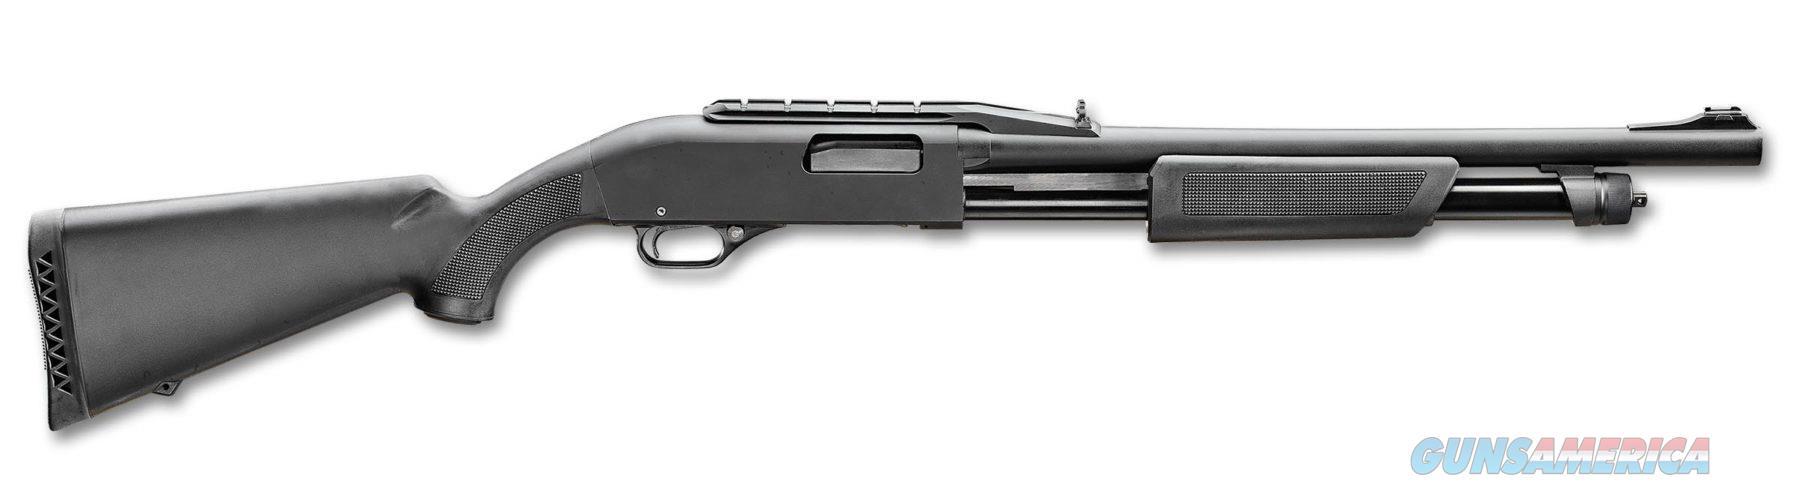 FN HERSTAL P-12 NIB FREE SHIPPING  Guns > Shotguns > FNH - Fabrique Nationale (FN) Shotguns > Pump